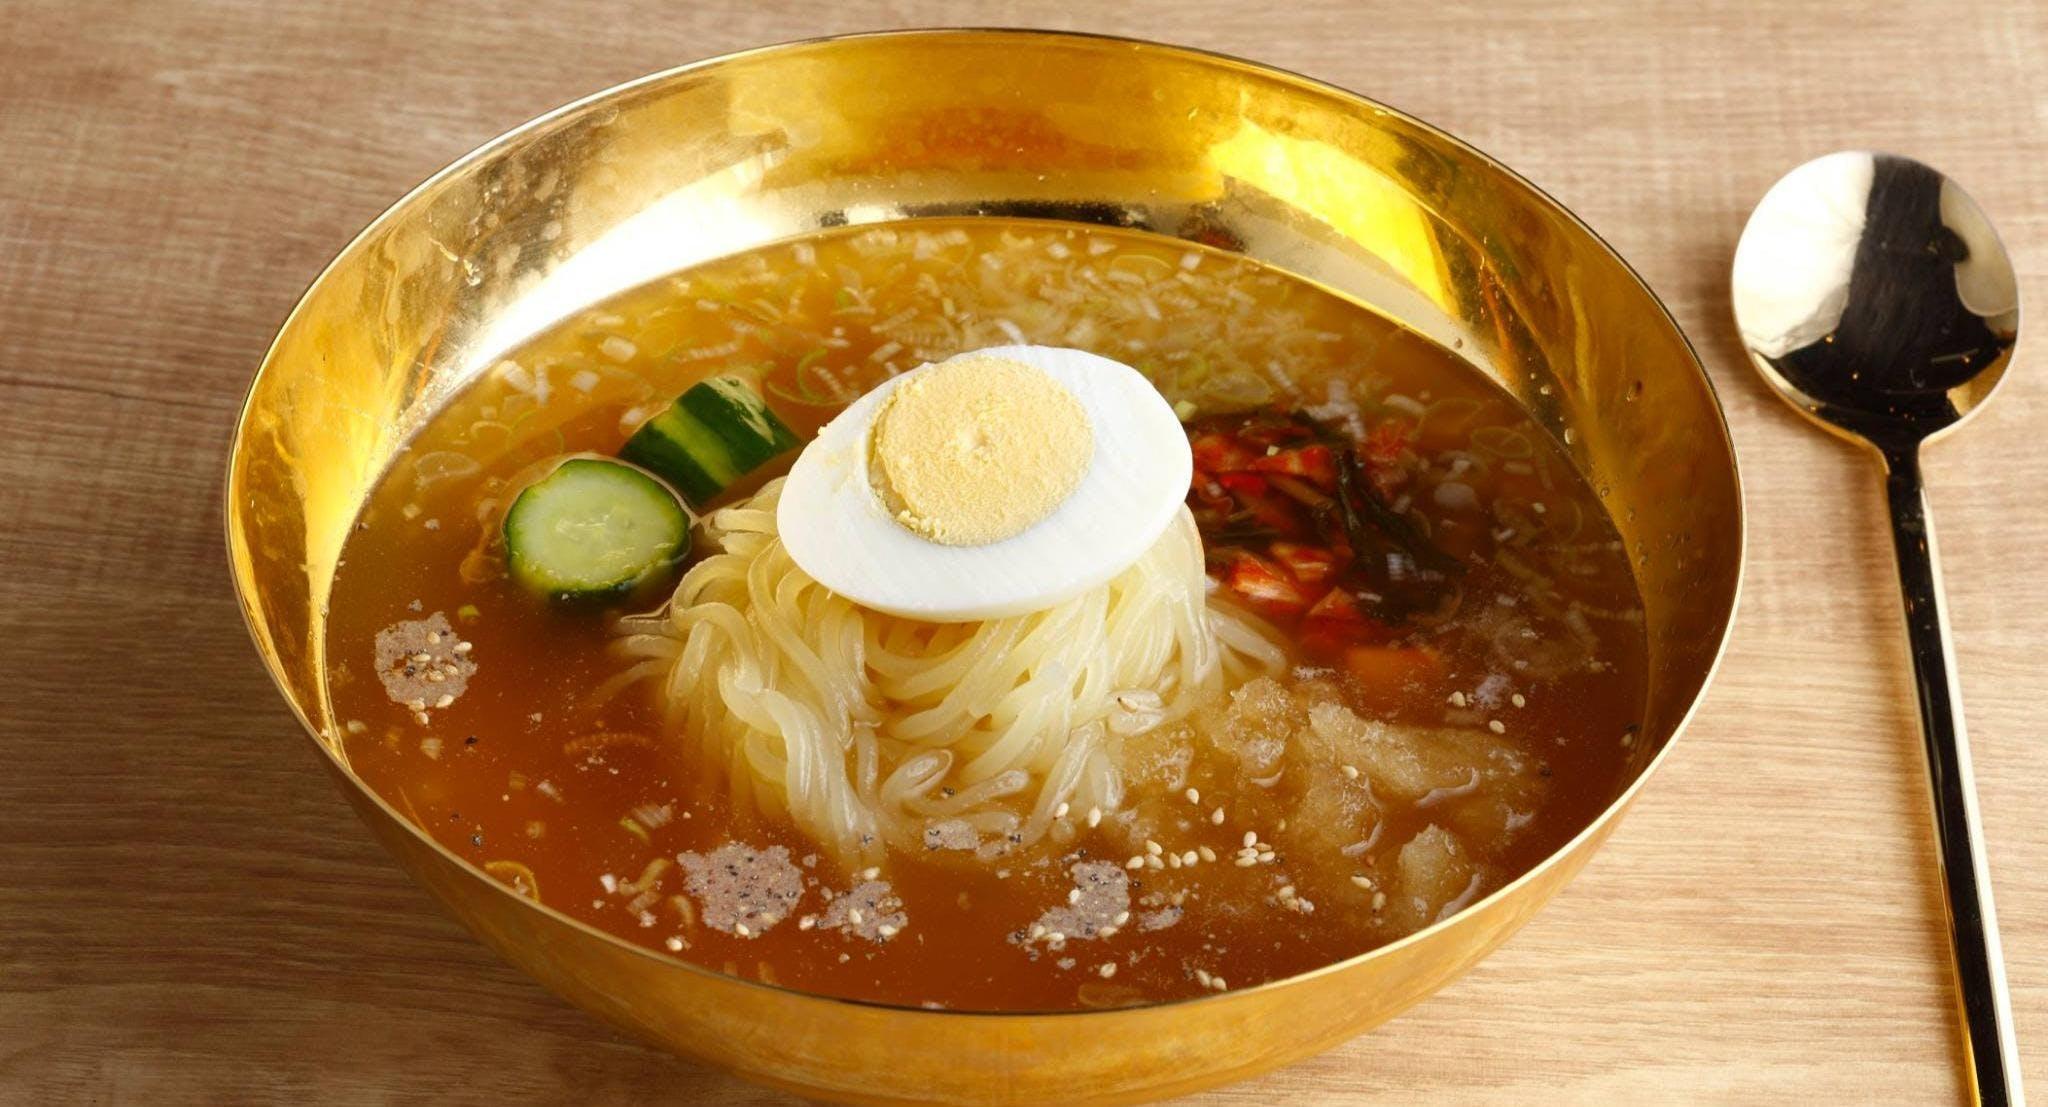 Yakiniku Futago HK 大阪燒肉 - Tsim Sha Tsui